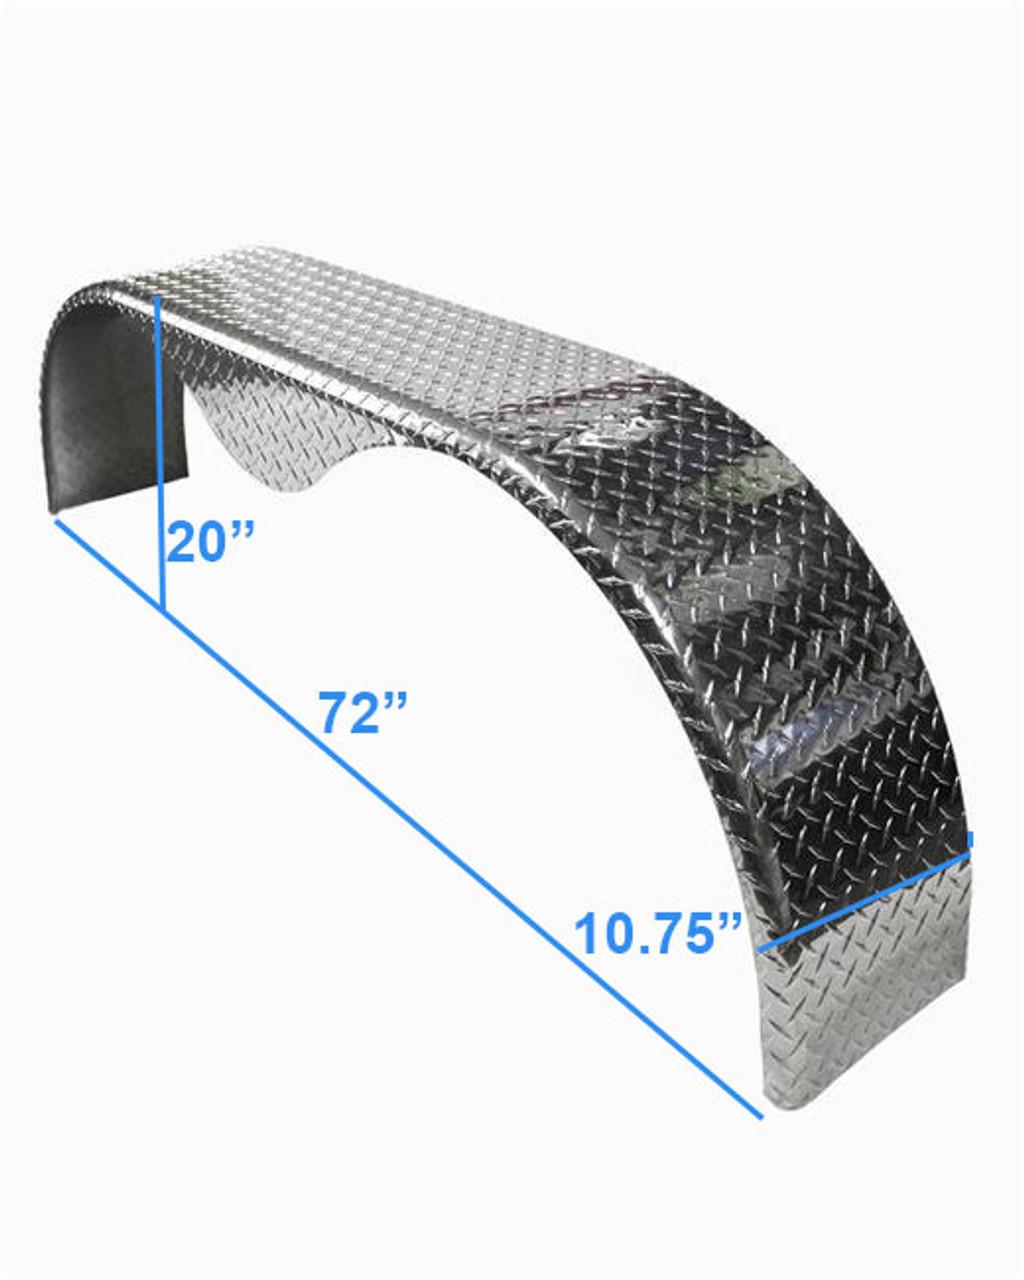 72x10-3/4 Aluminum Tread Plate Trailer Fender - Tandem Axle Teardrop - One Fender